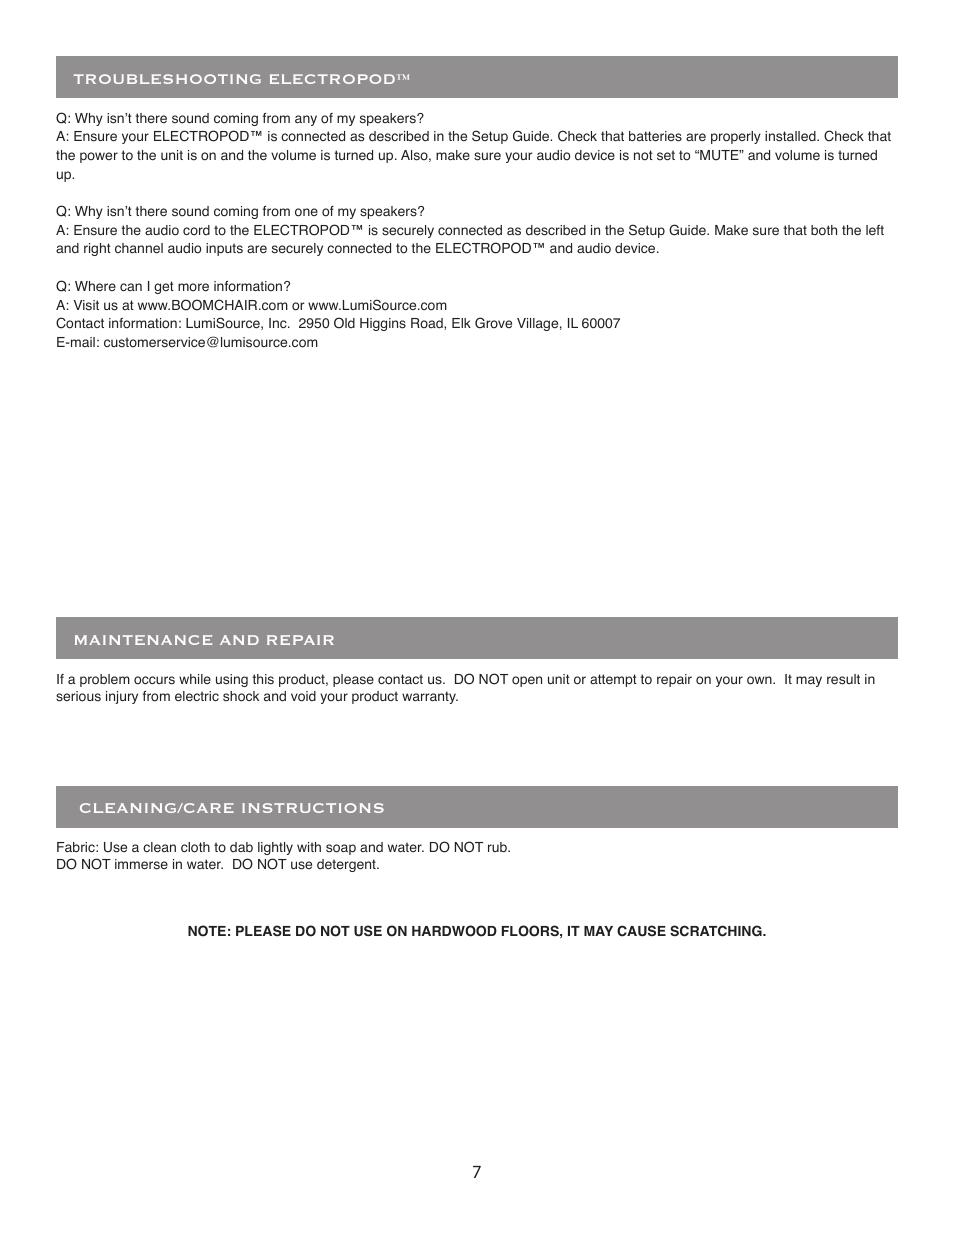 BoomChair ElectroPod User Manual | Page 7 / 8 | Original mode